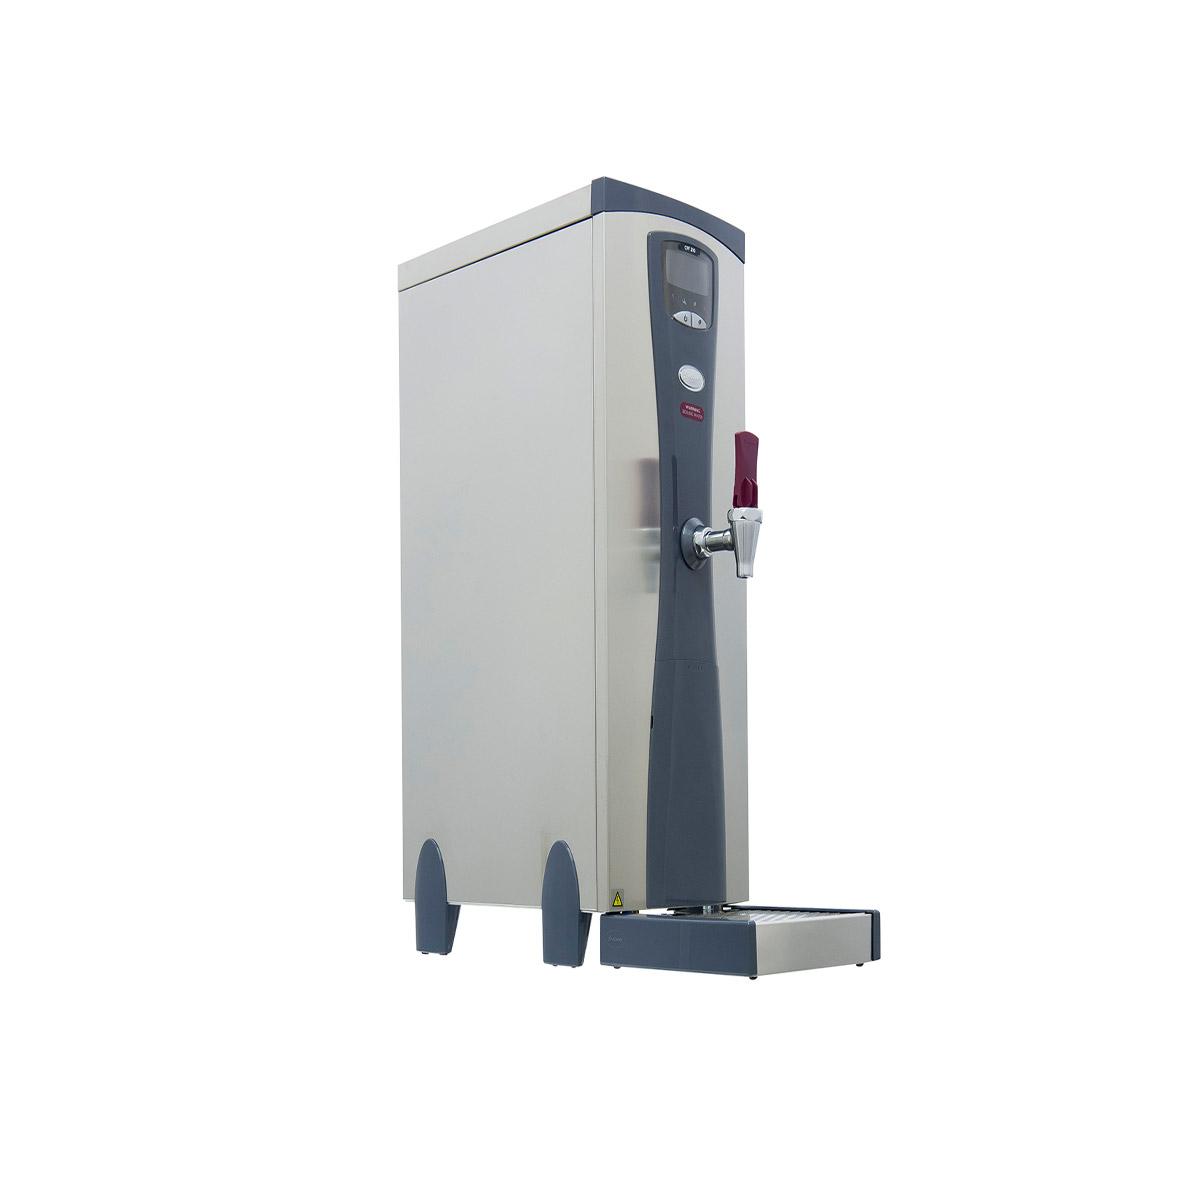 Instanta Sureflow Plus Counter Top Water Boiler CTSP10H High Tap Filtered 10Ltr